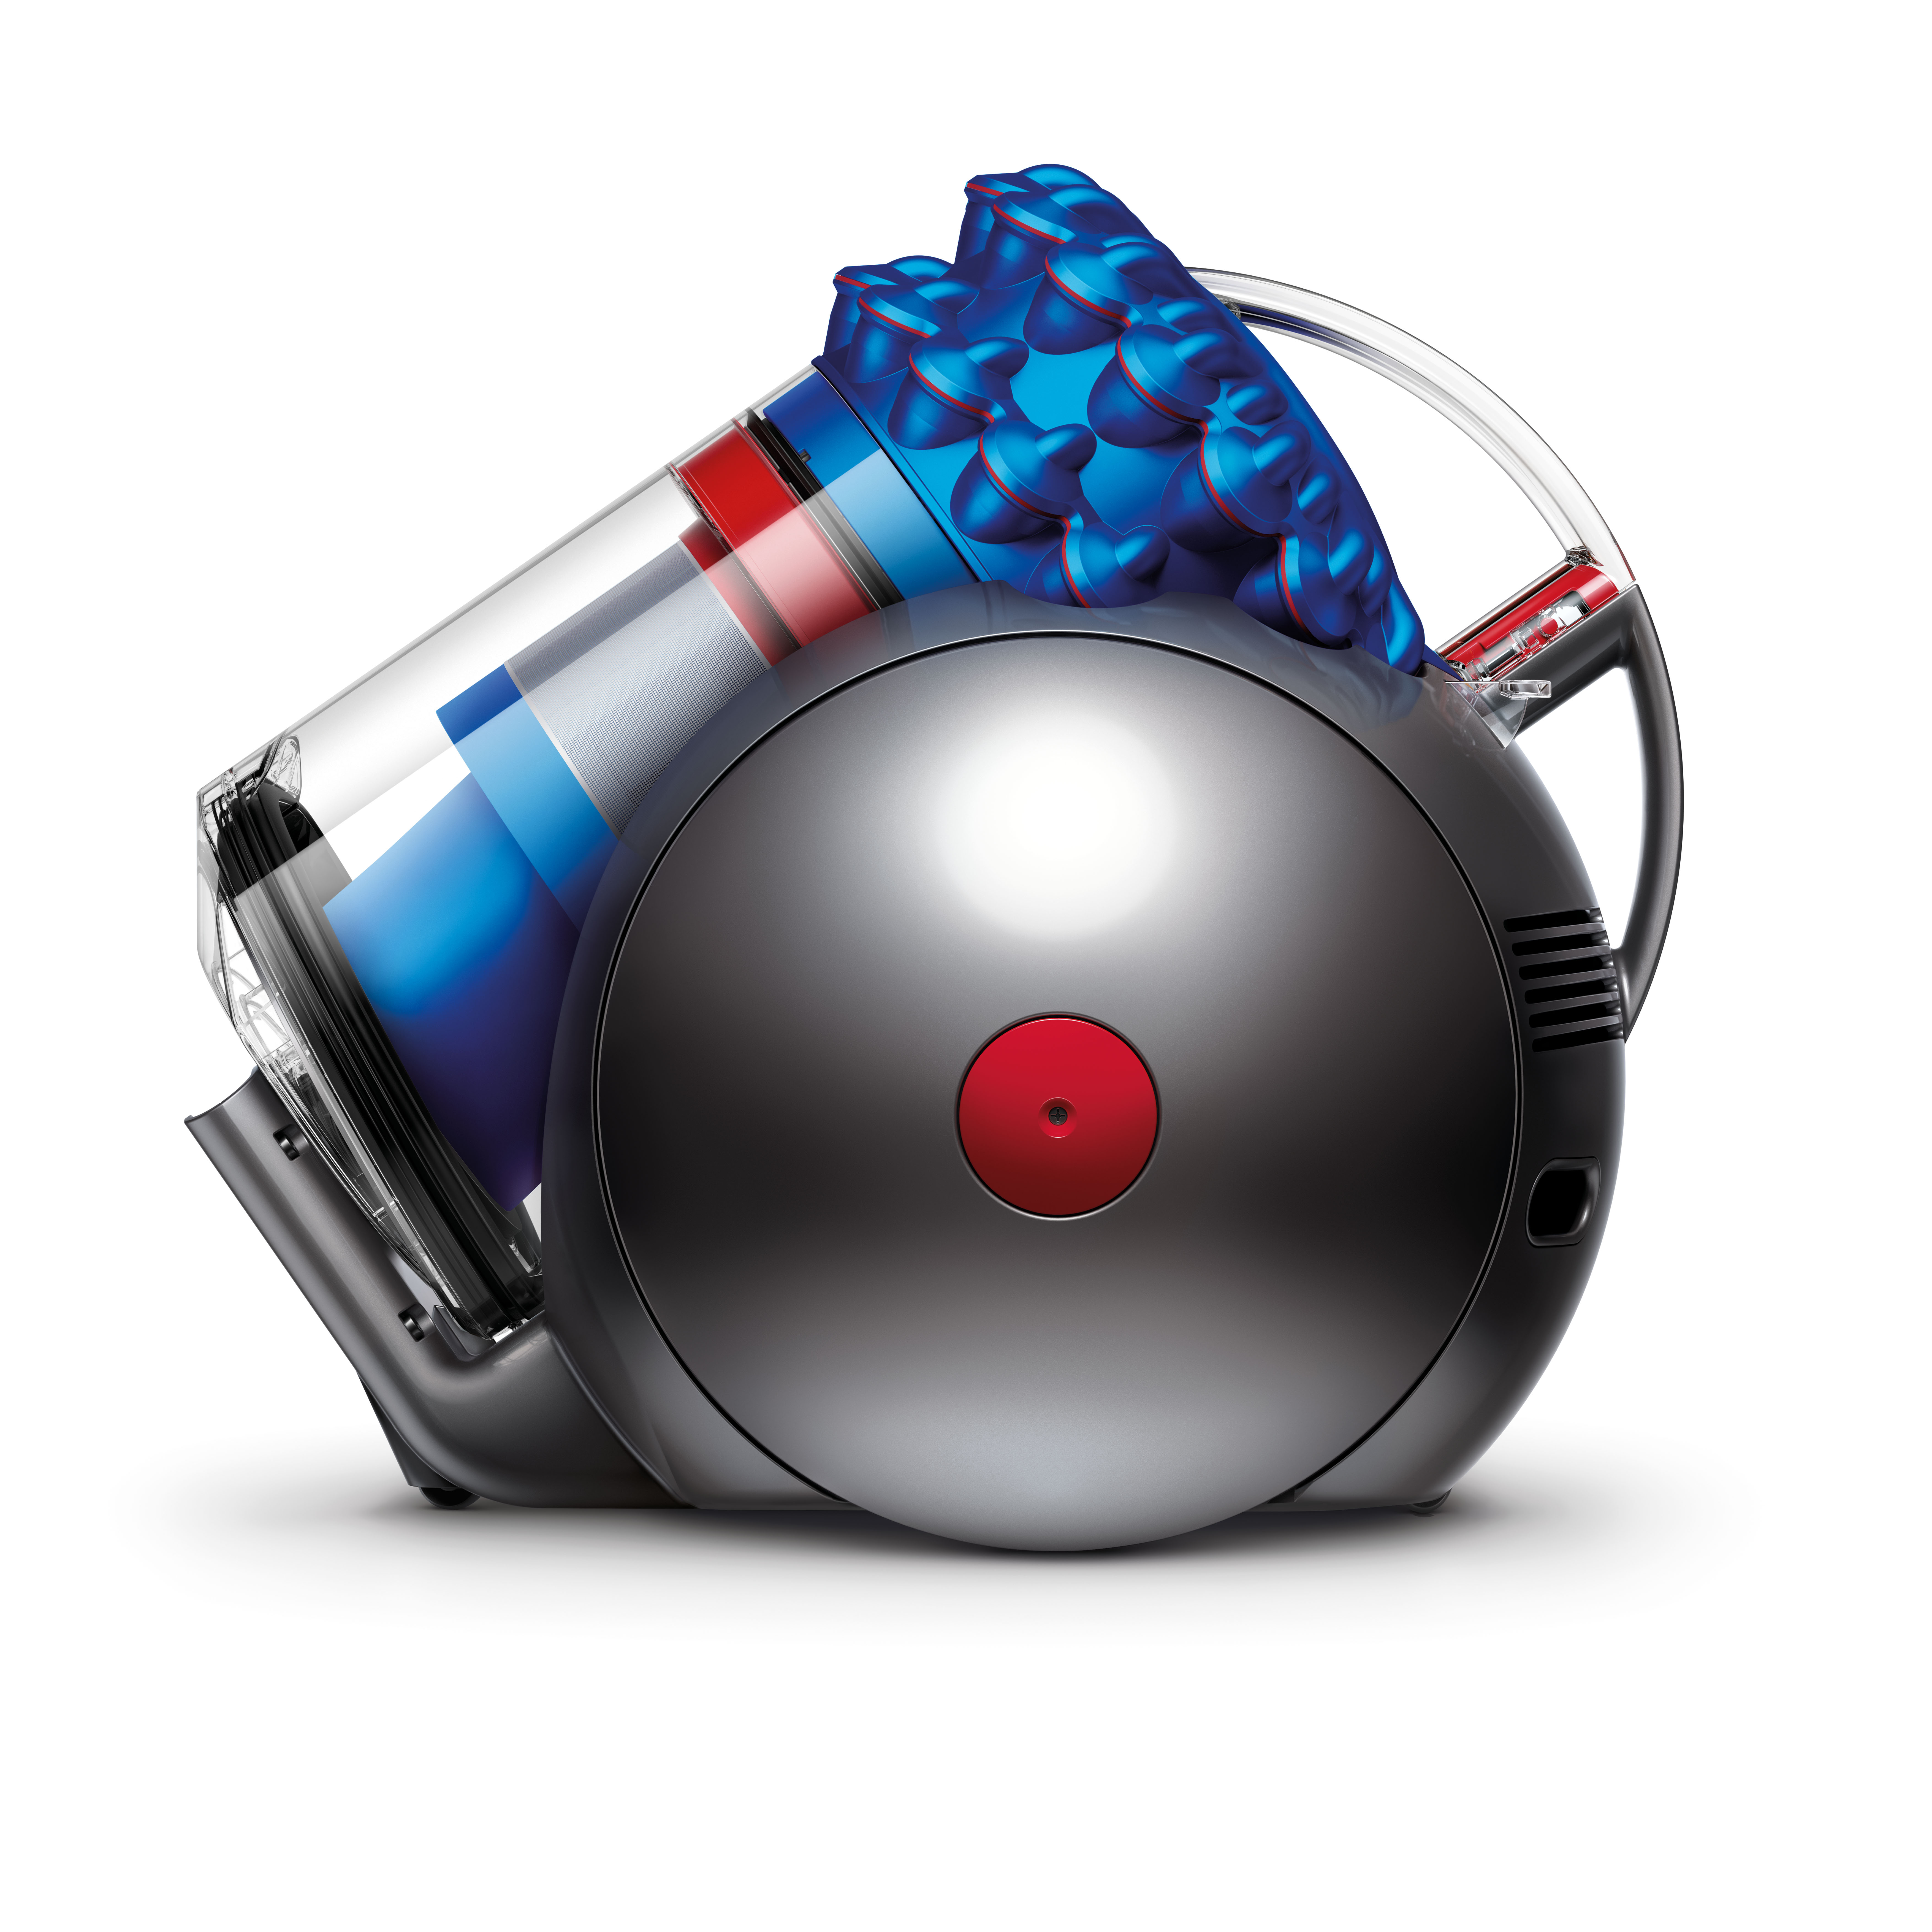 dyson cinetic big ball allergy vacuum new aud. Black Bedroom Furniture Sets. Home Design Ideas